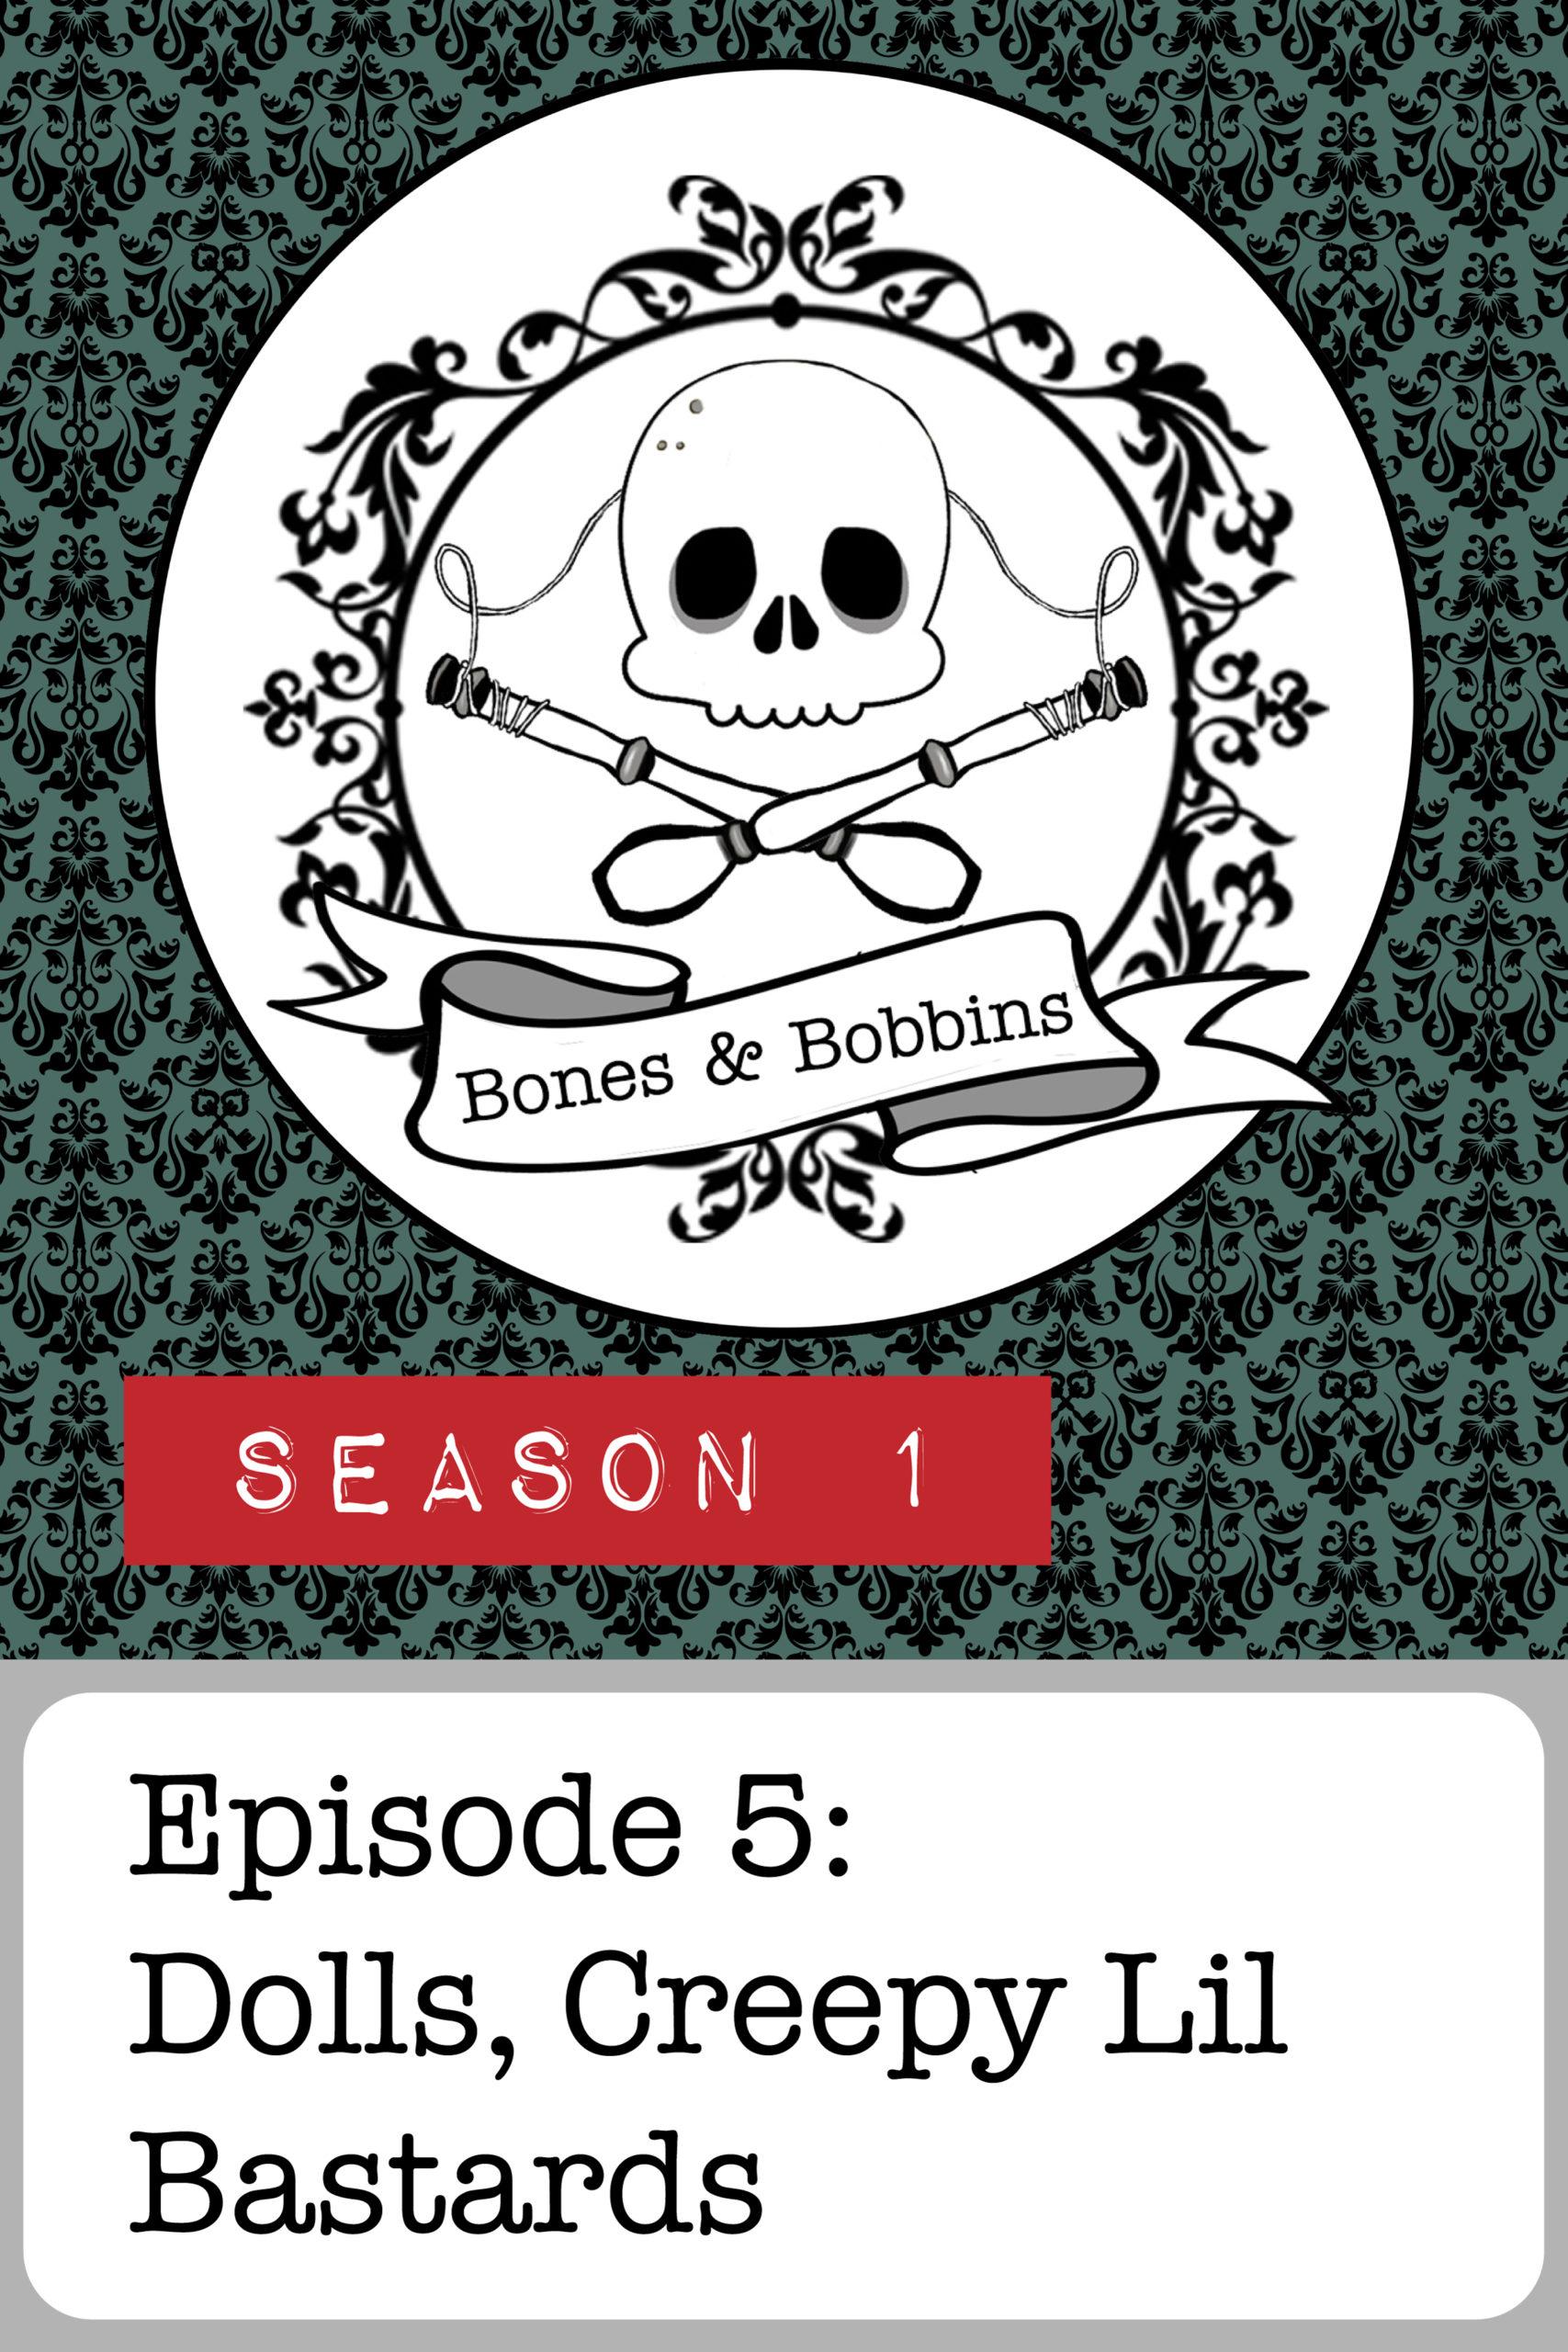 The Bones and Bobbins Podcast, Season 1, Episode 05: Dolls, Creepy Lil Bastards